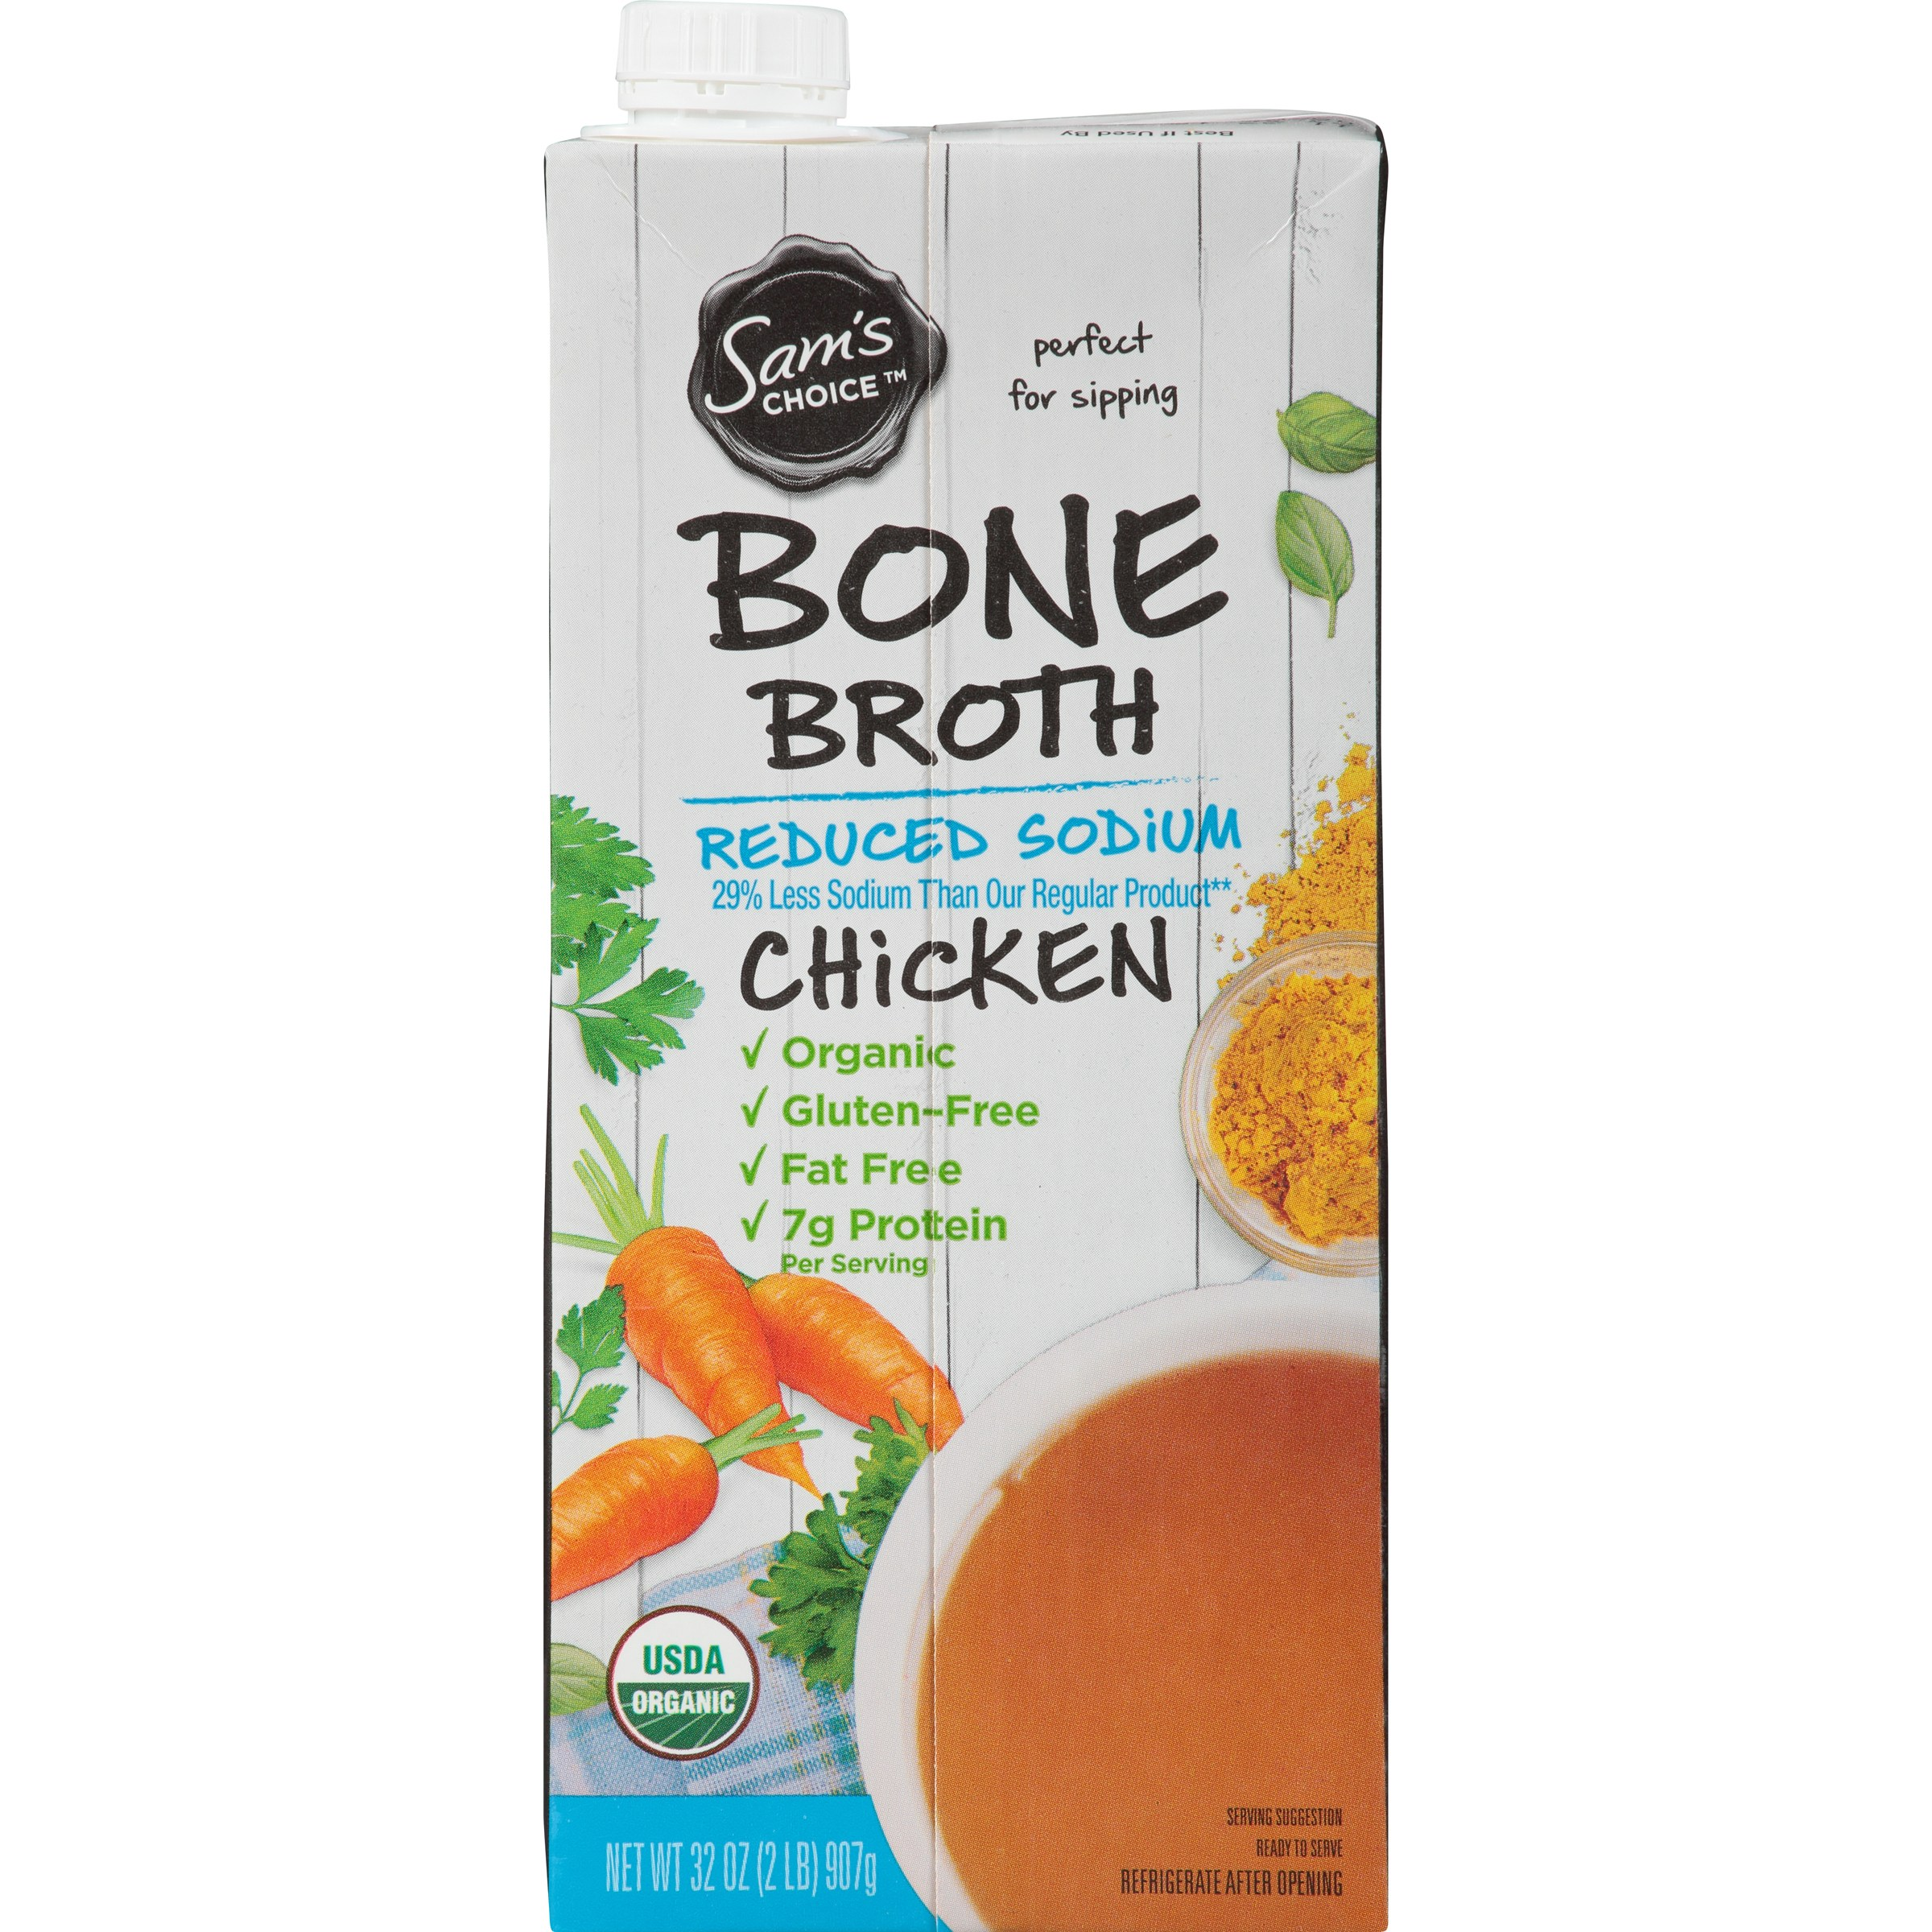 (6 Pack) Sam's Choice Organic Chicken Bone Broth, Reduced Sodium, 32 oz